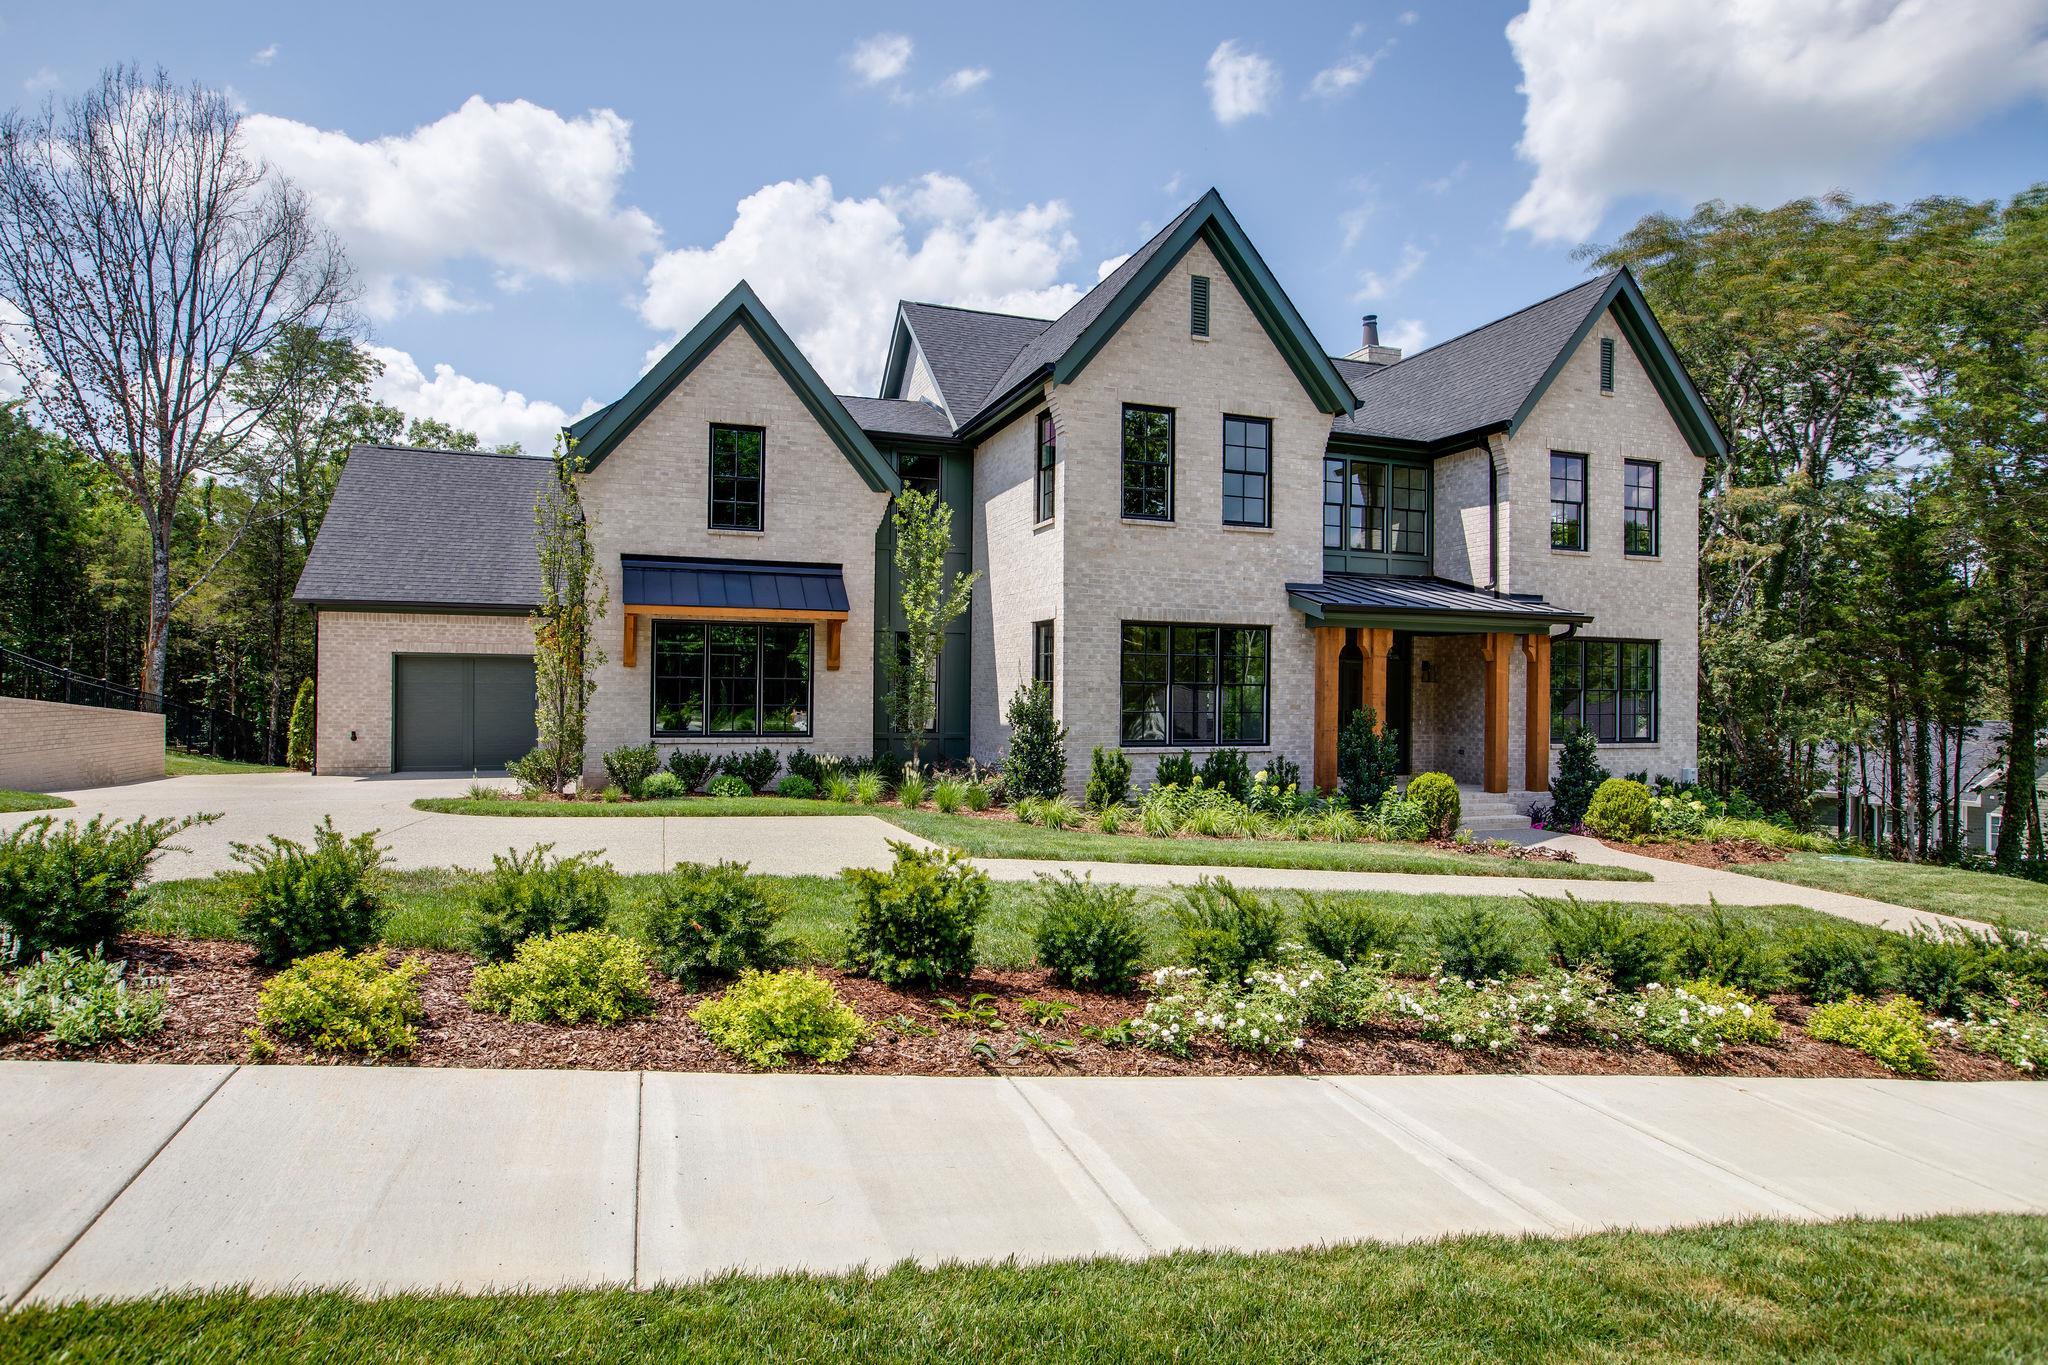 8559 Heirloom Blvd (Lot 7013), College Grove, TN 37046 - College Grove, TN real estate listing